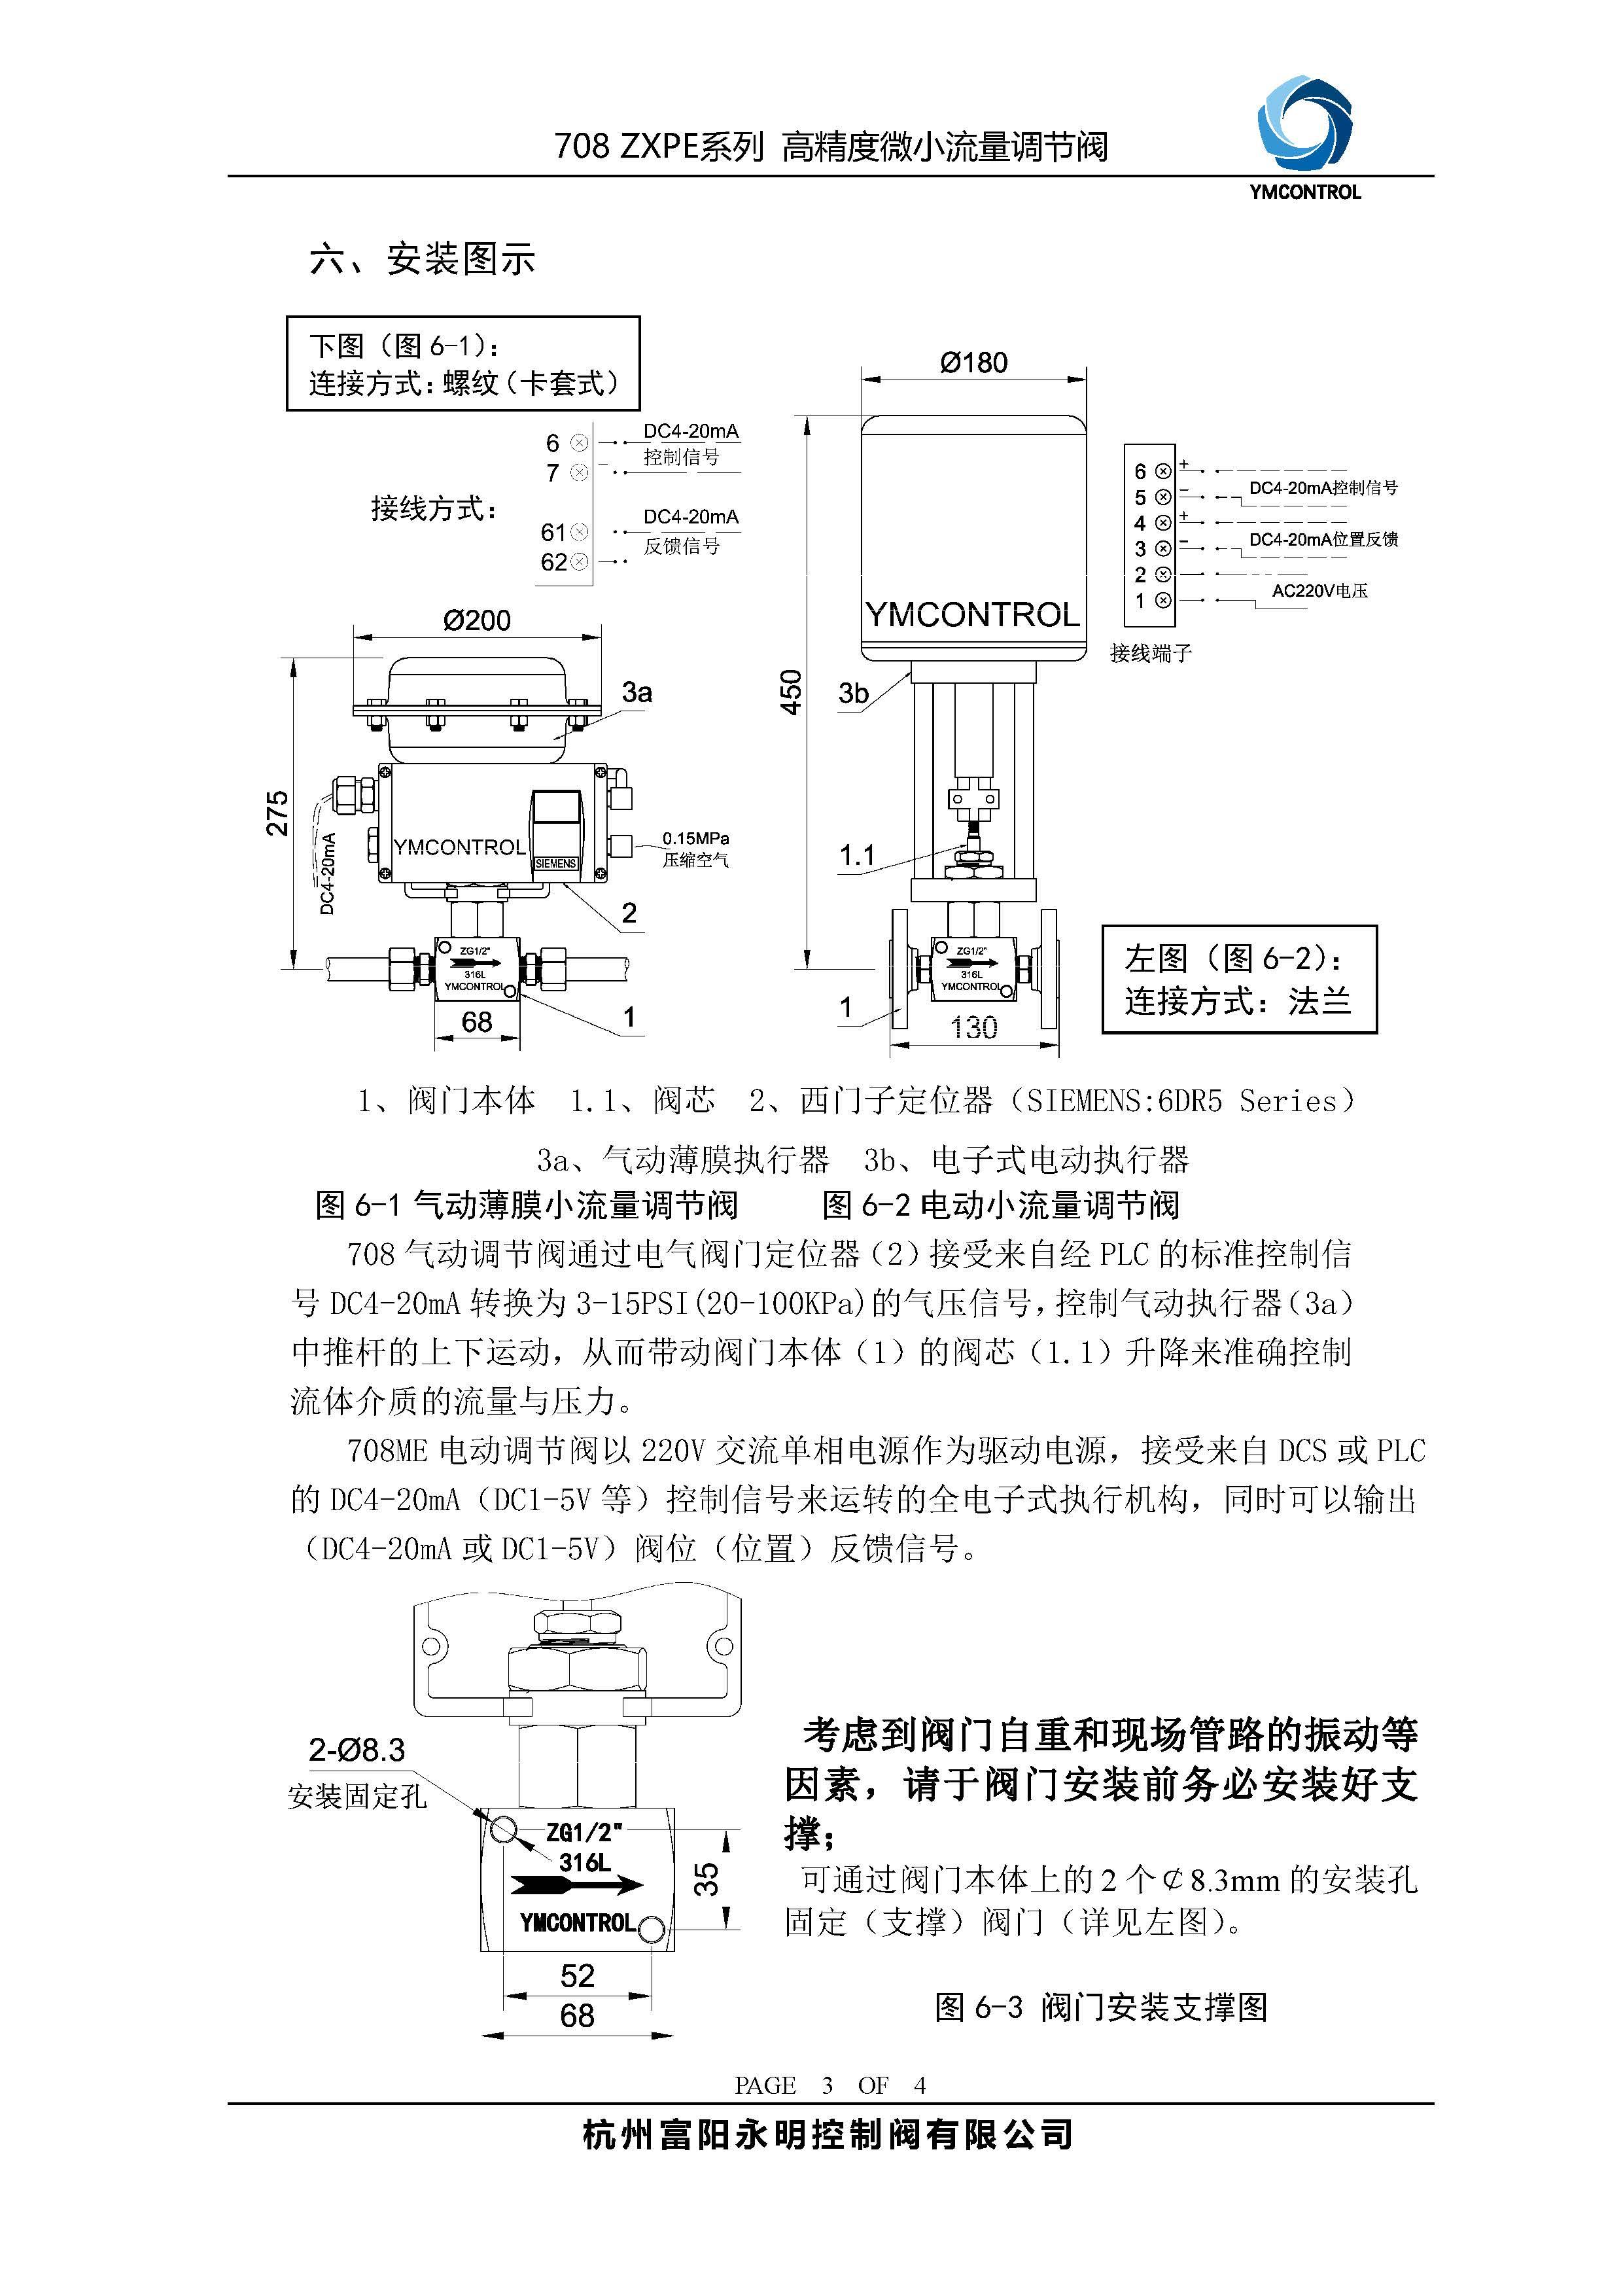 708-ZXPE微小流量调节阀产品使用说明书